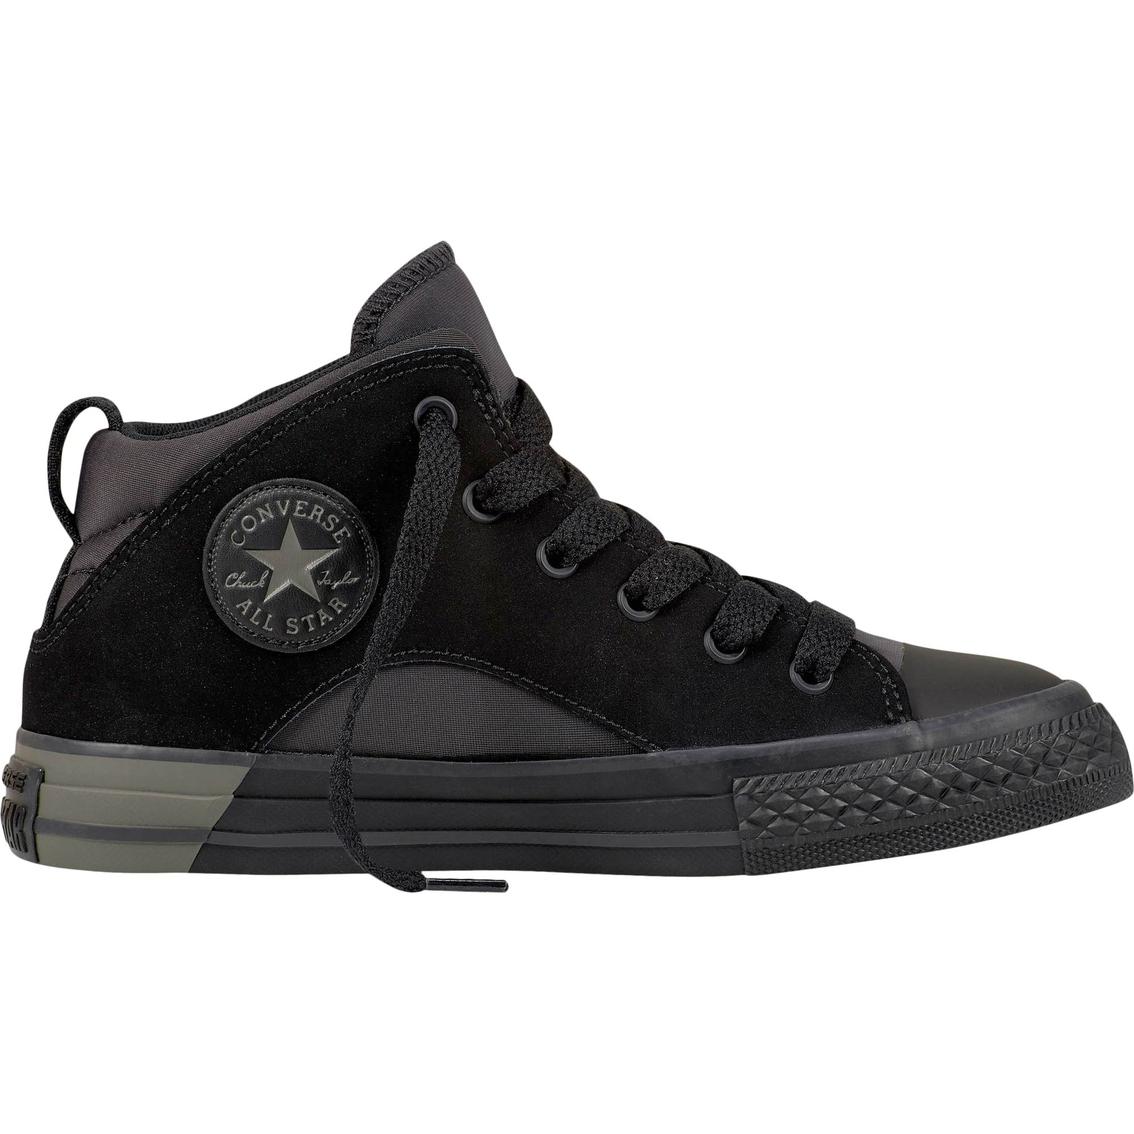 de542b95ba9a Converse Boys Chuck Taylor All Star Official Mid Top Sneakers ...